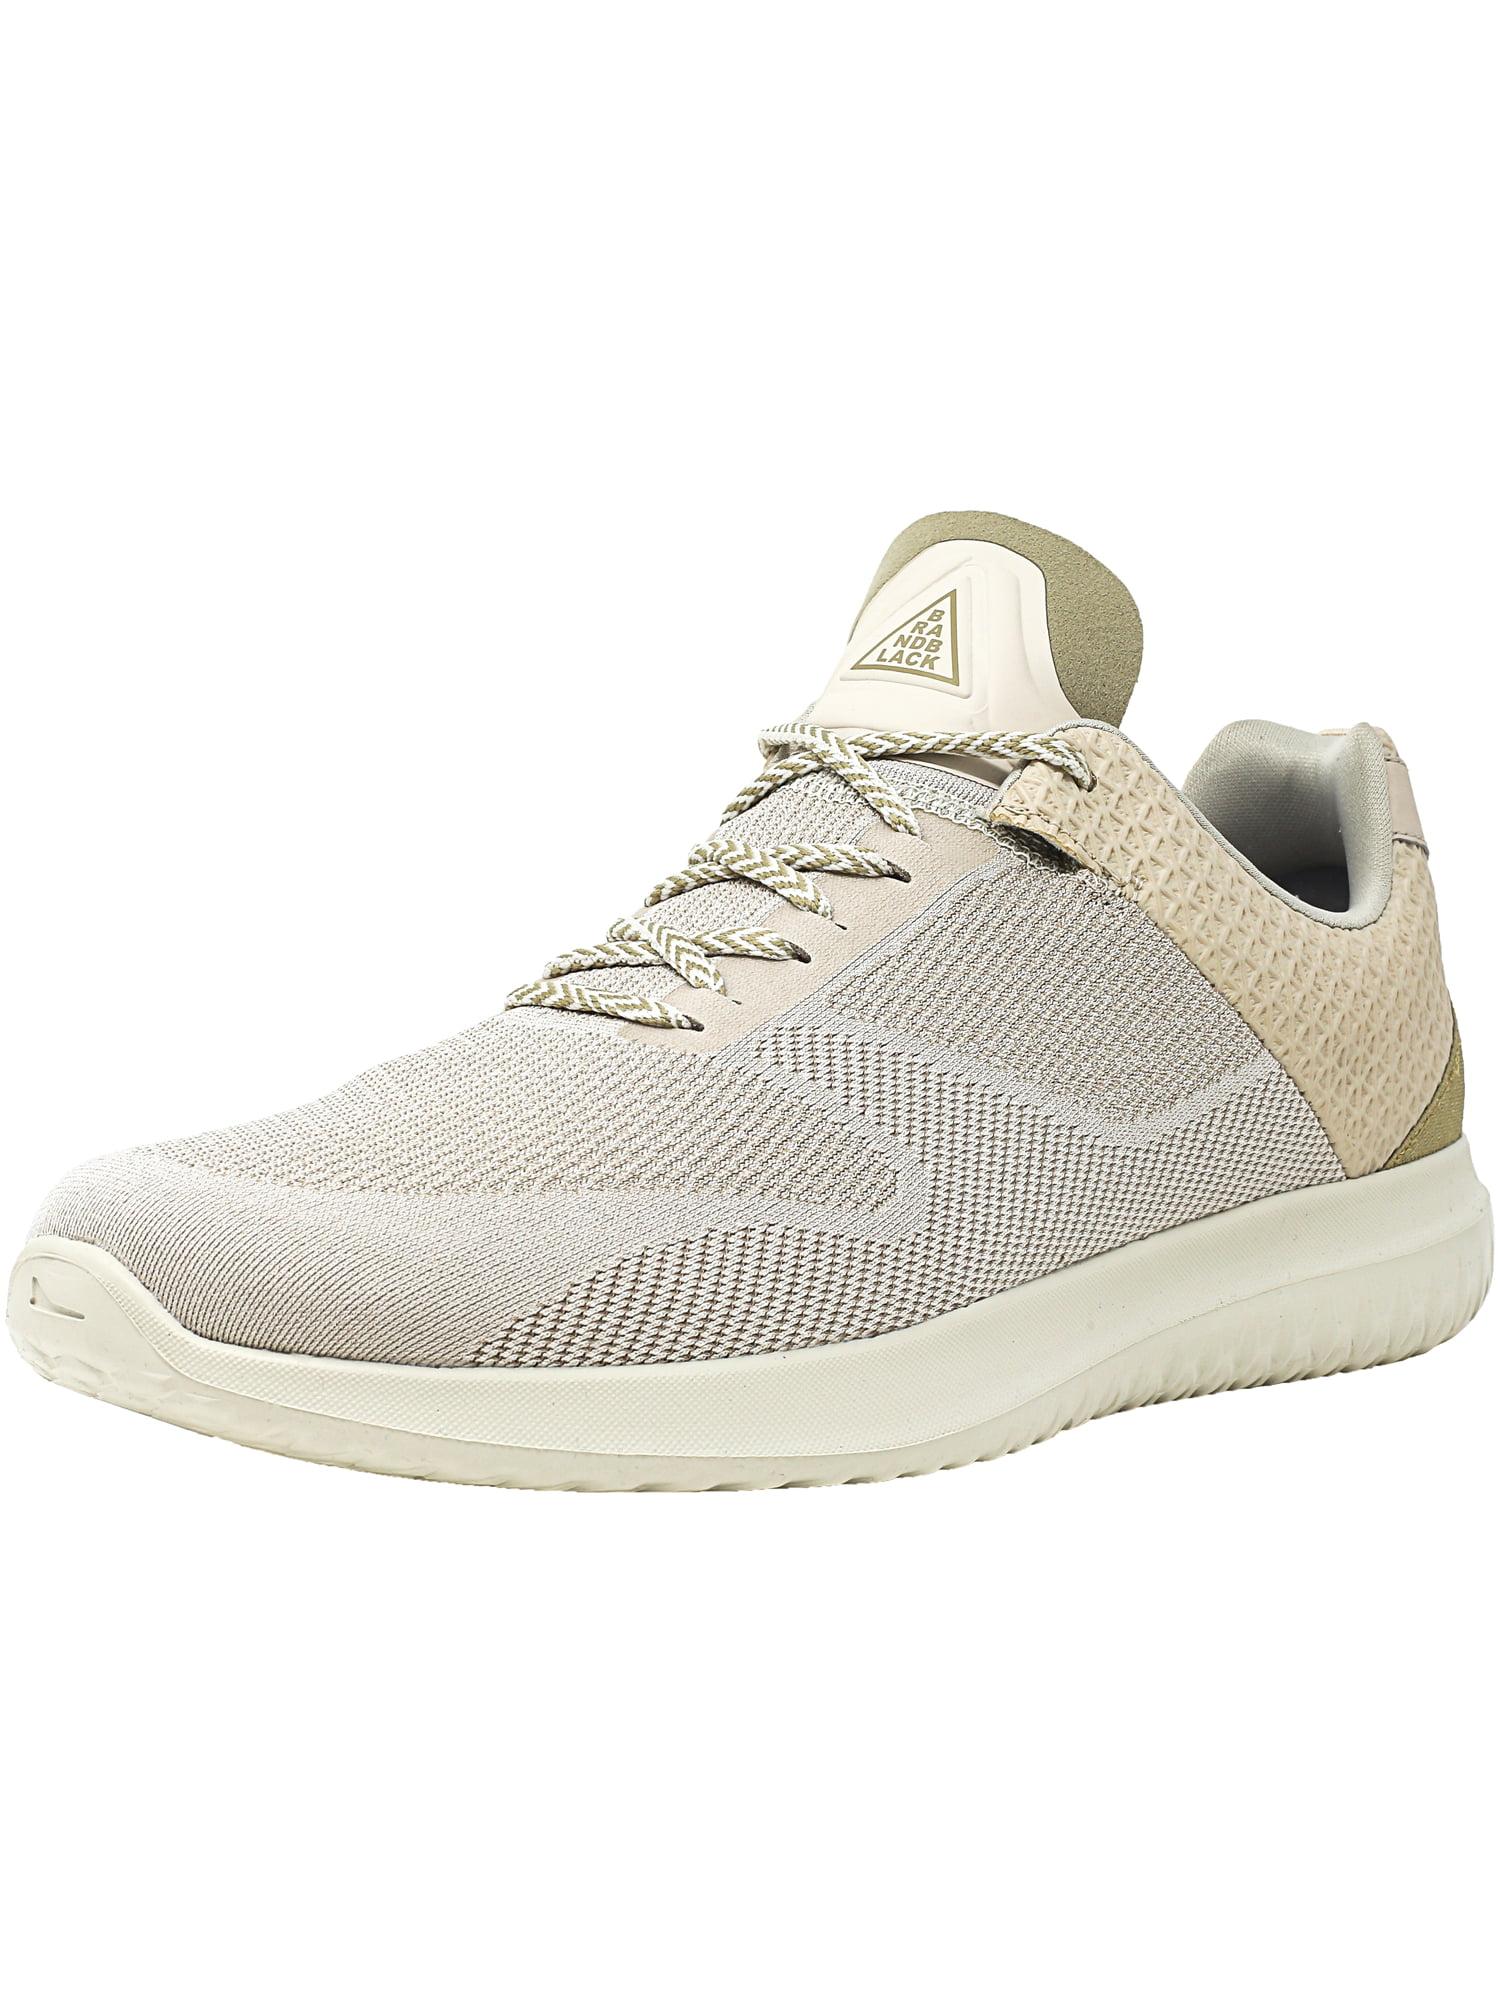 Brandblack Men's No Name Shadow Natural Ankle-High Fashion Sneaker - 9M